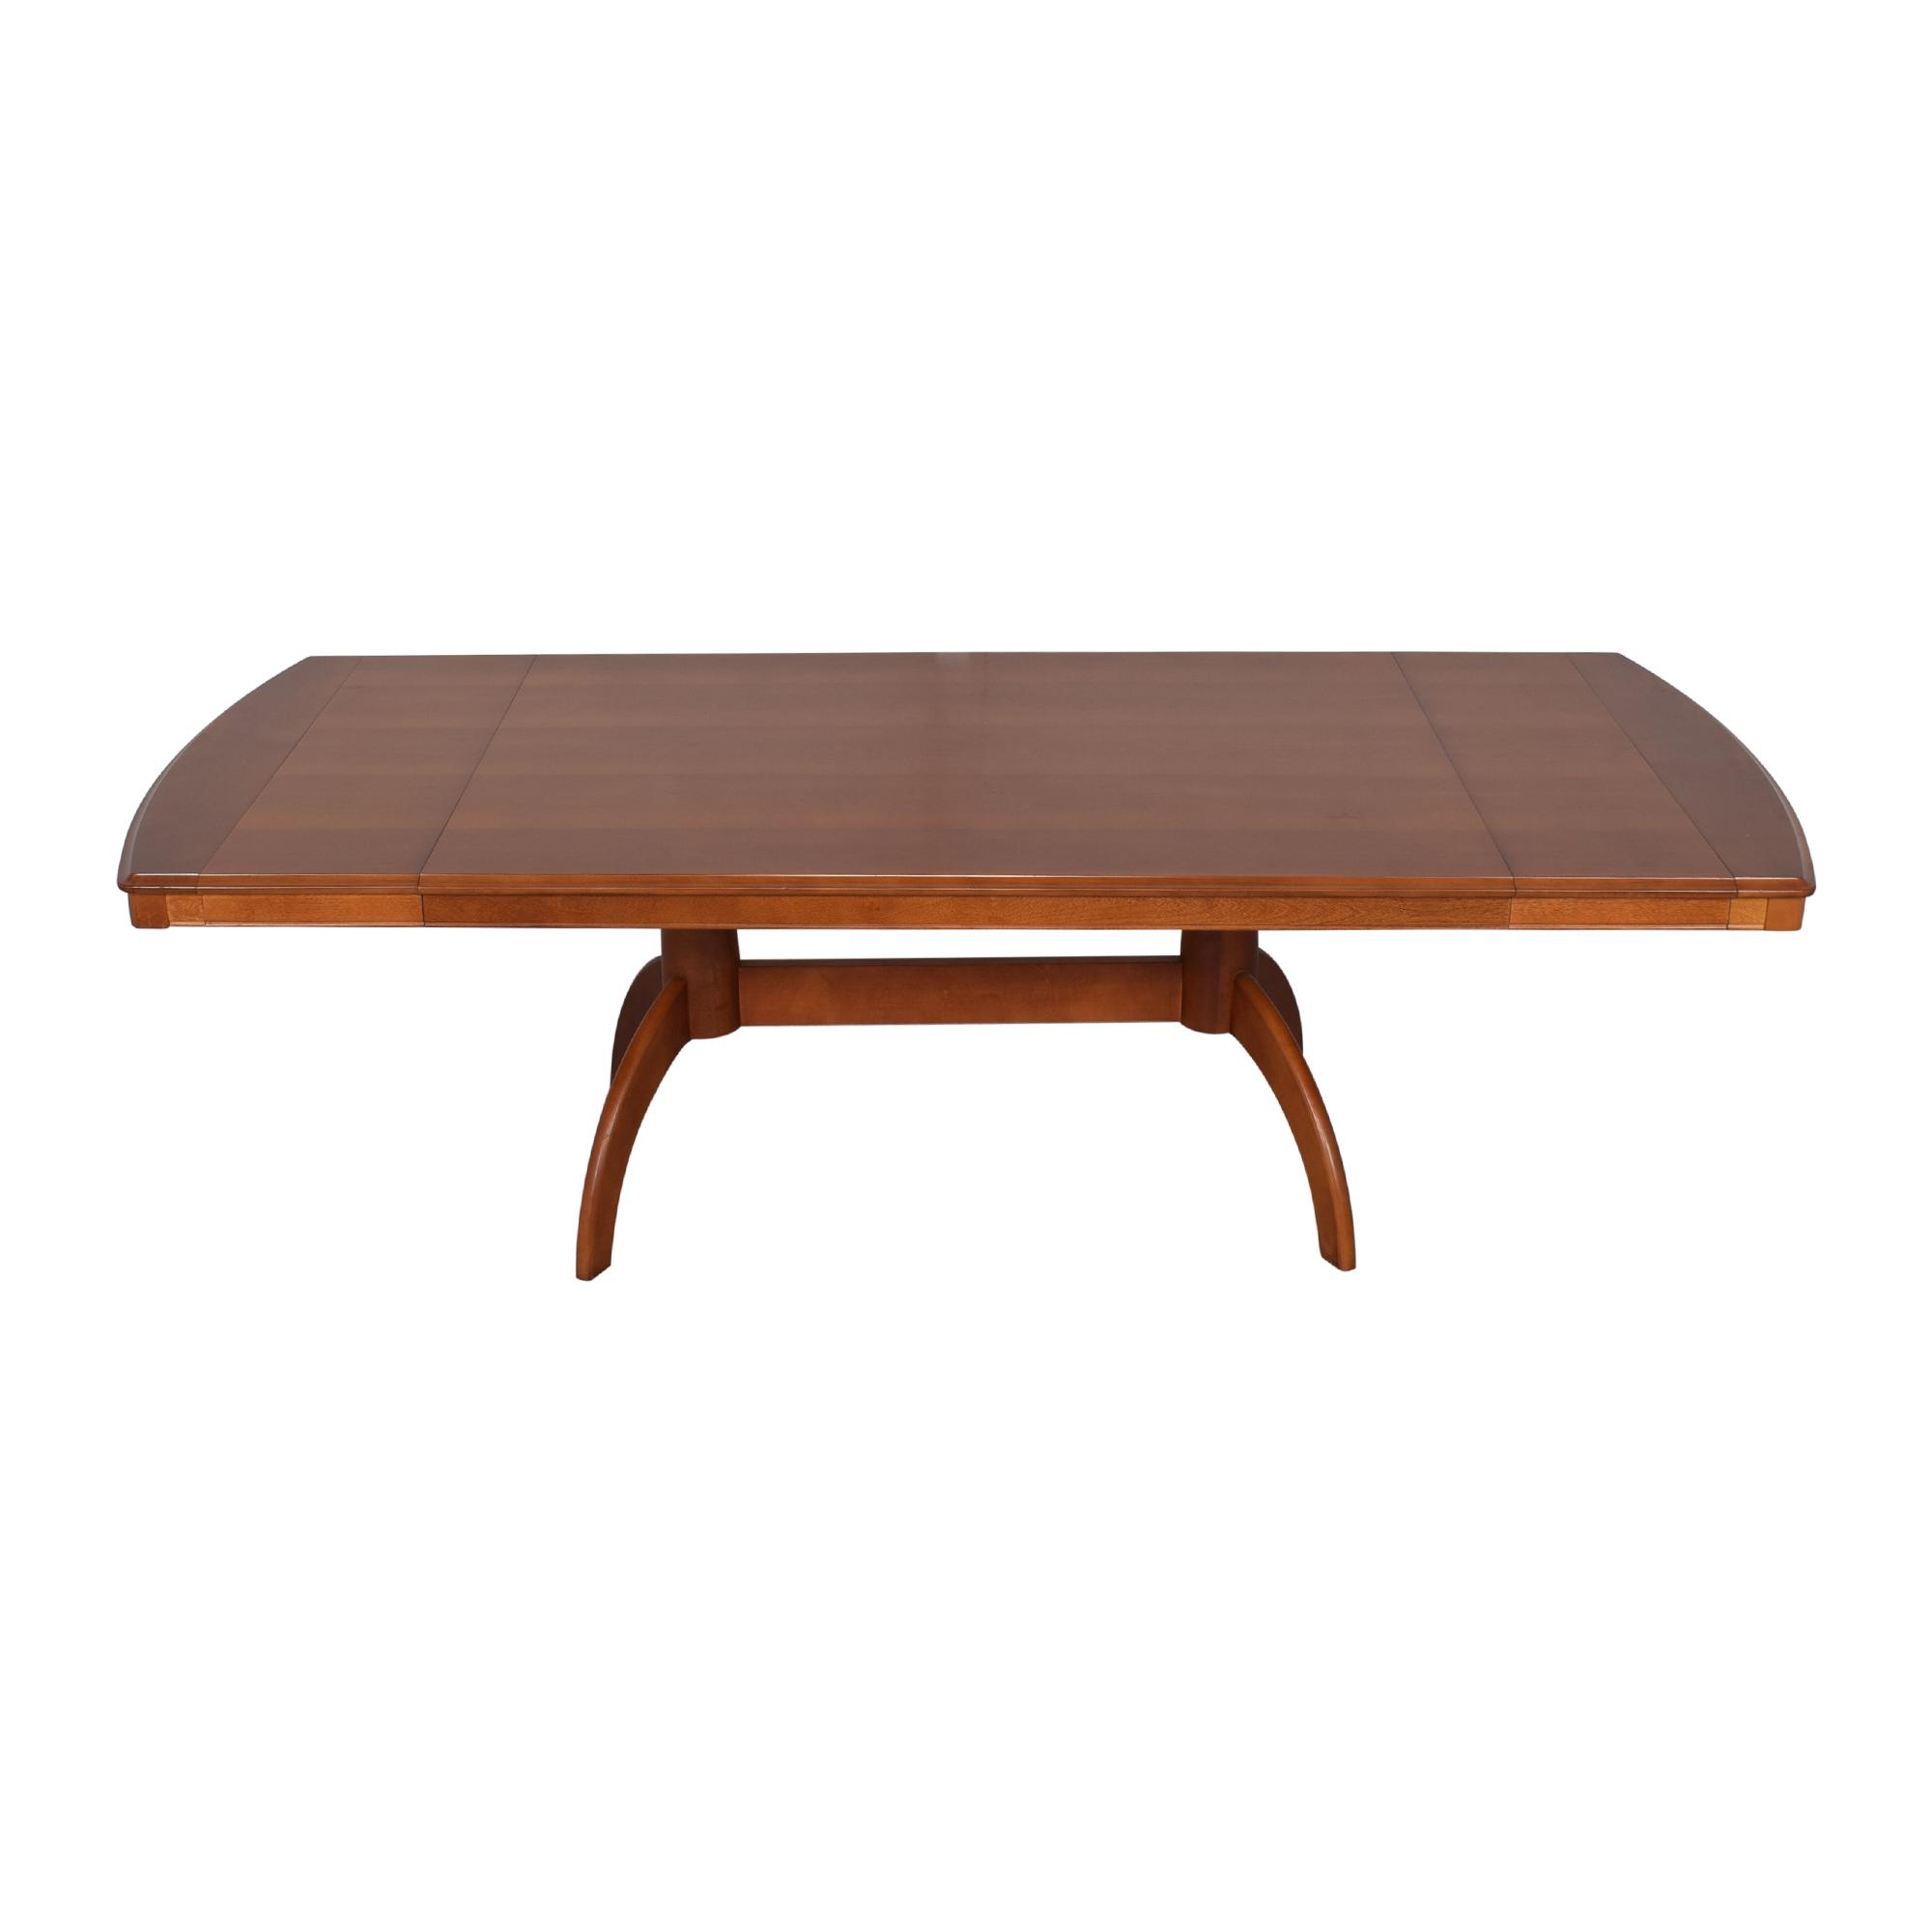 Bassett Furniture Bassett Extendable Dining Table second hand